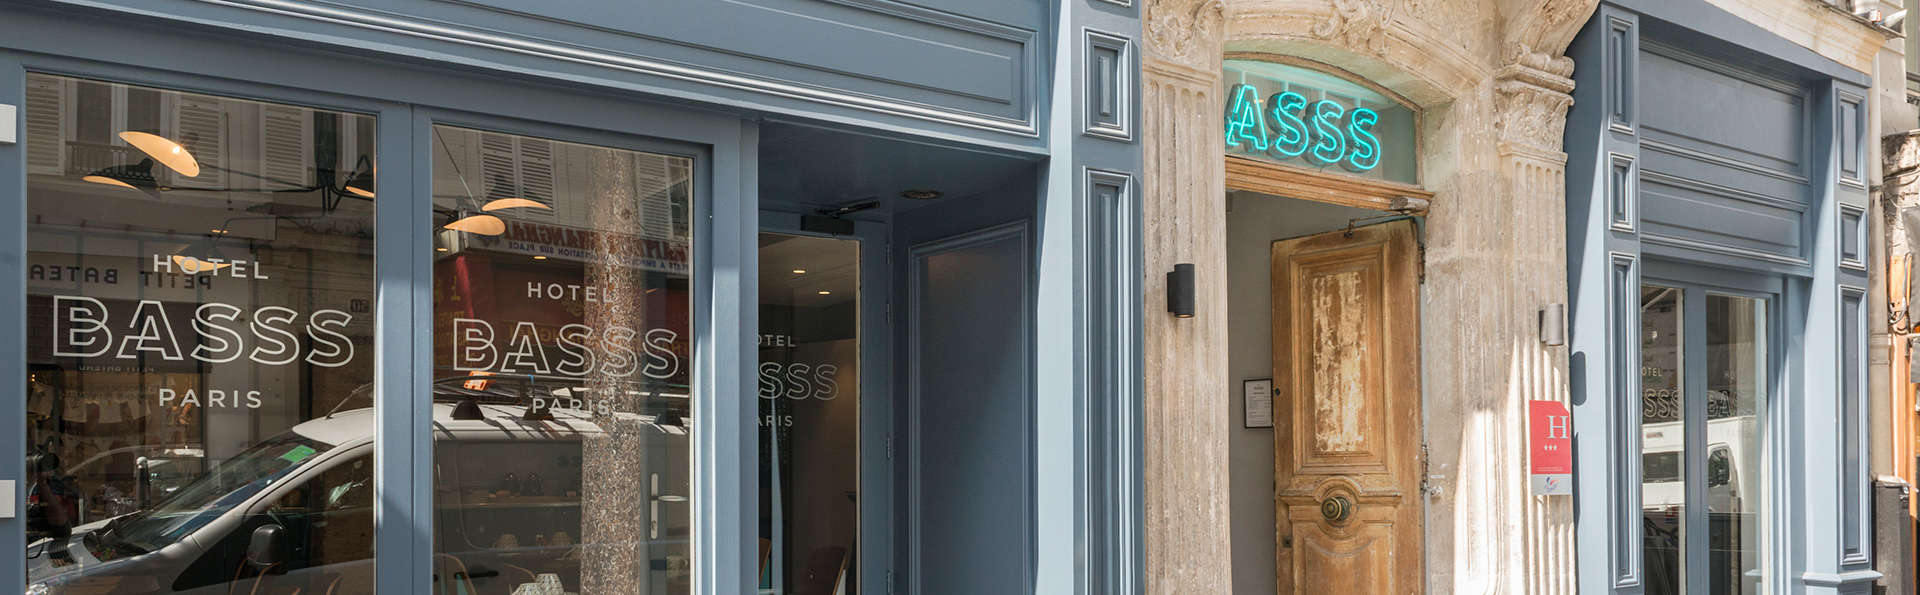 Hotel Basss - Montmartre - EDIT_front.jpg